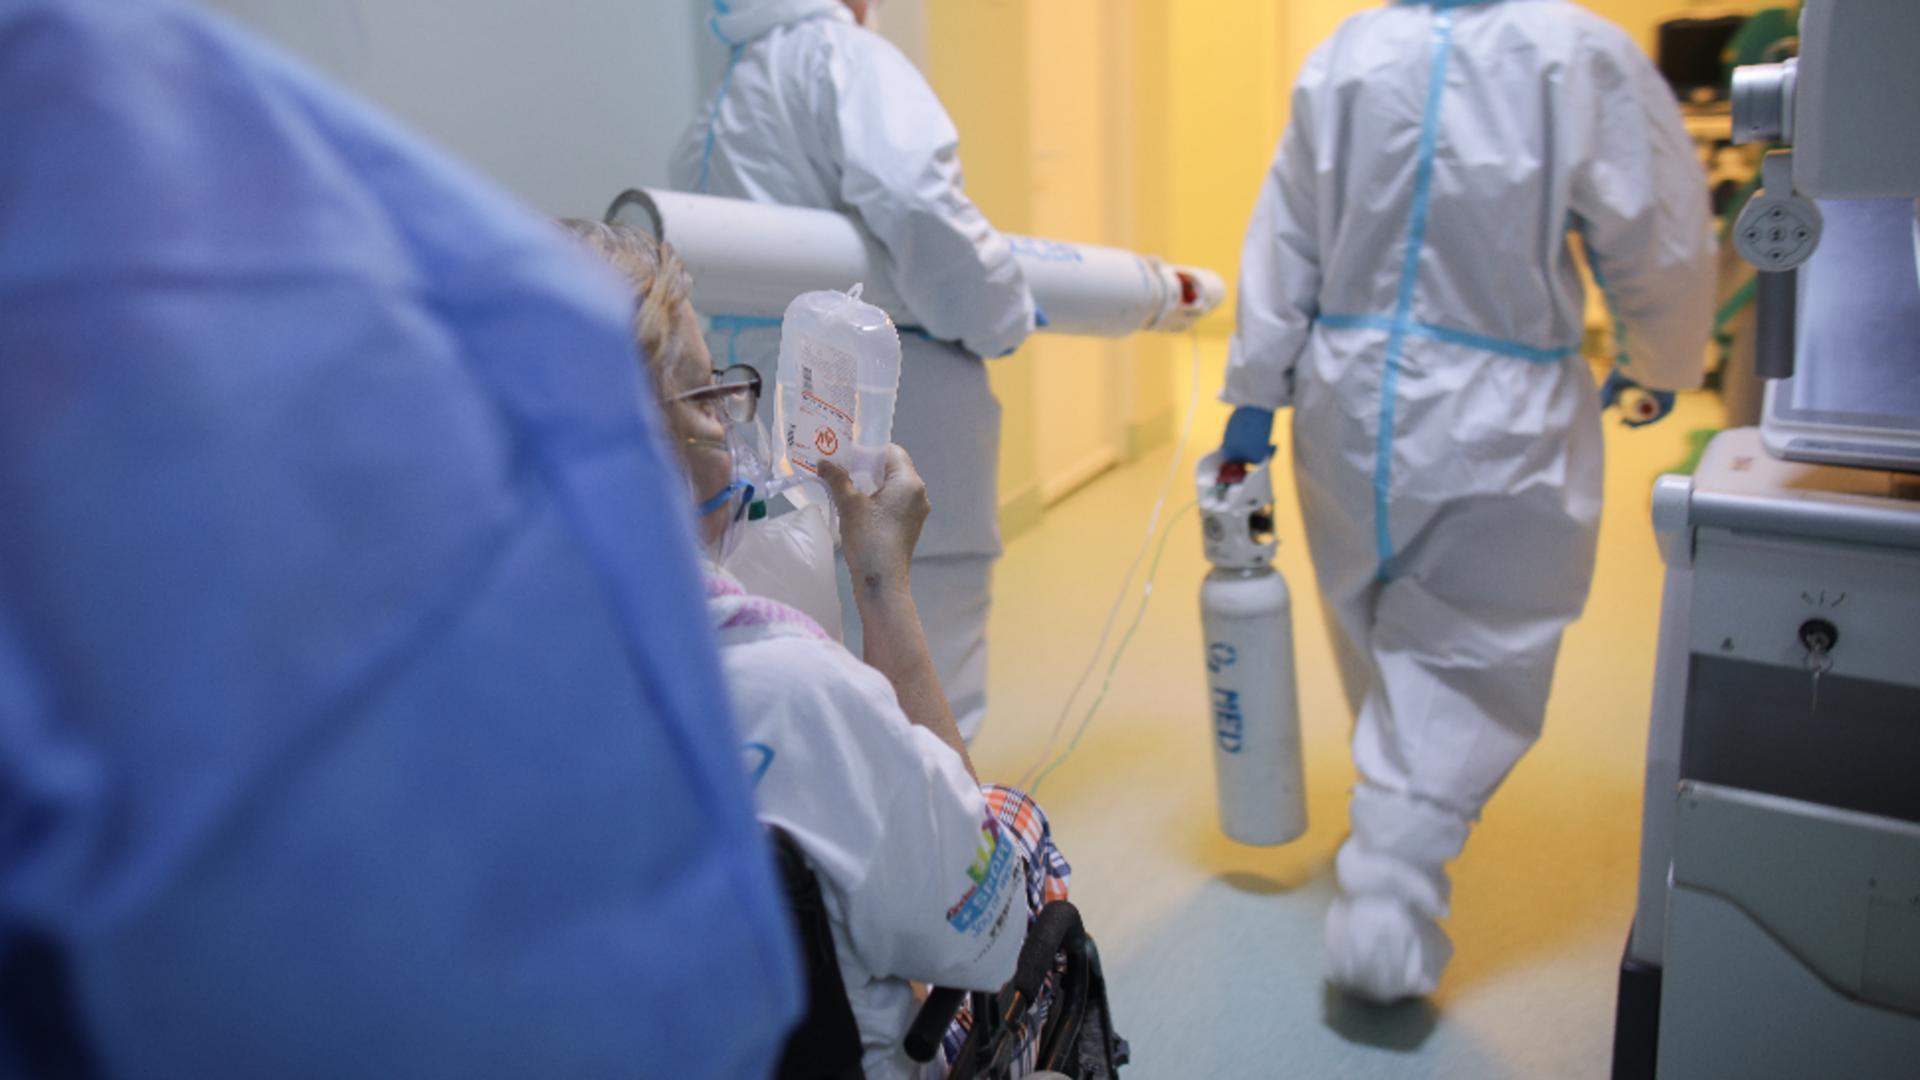 4 angajați și 7 pacienți, depistați pozitiv la Spitalul Județean Piatra Neamț. Foto/Inquam